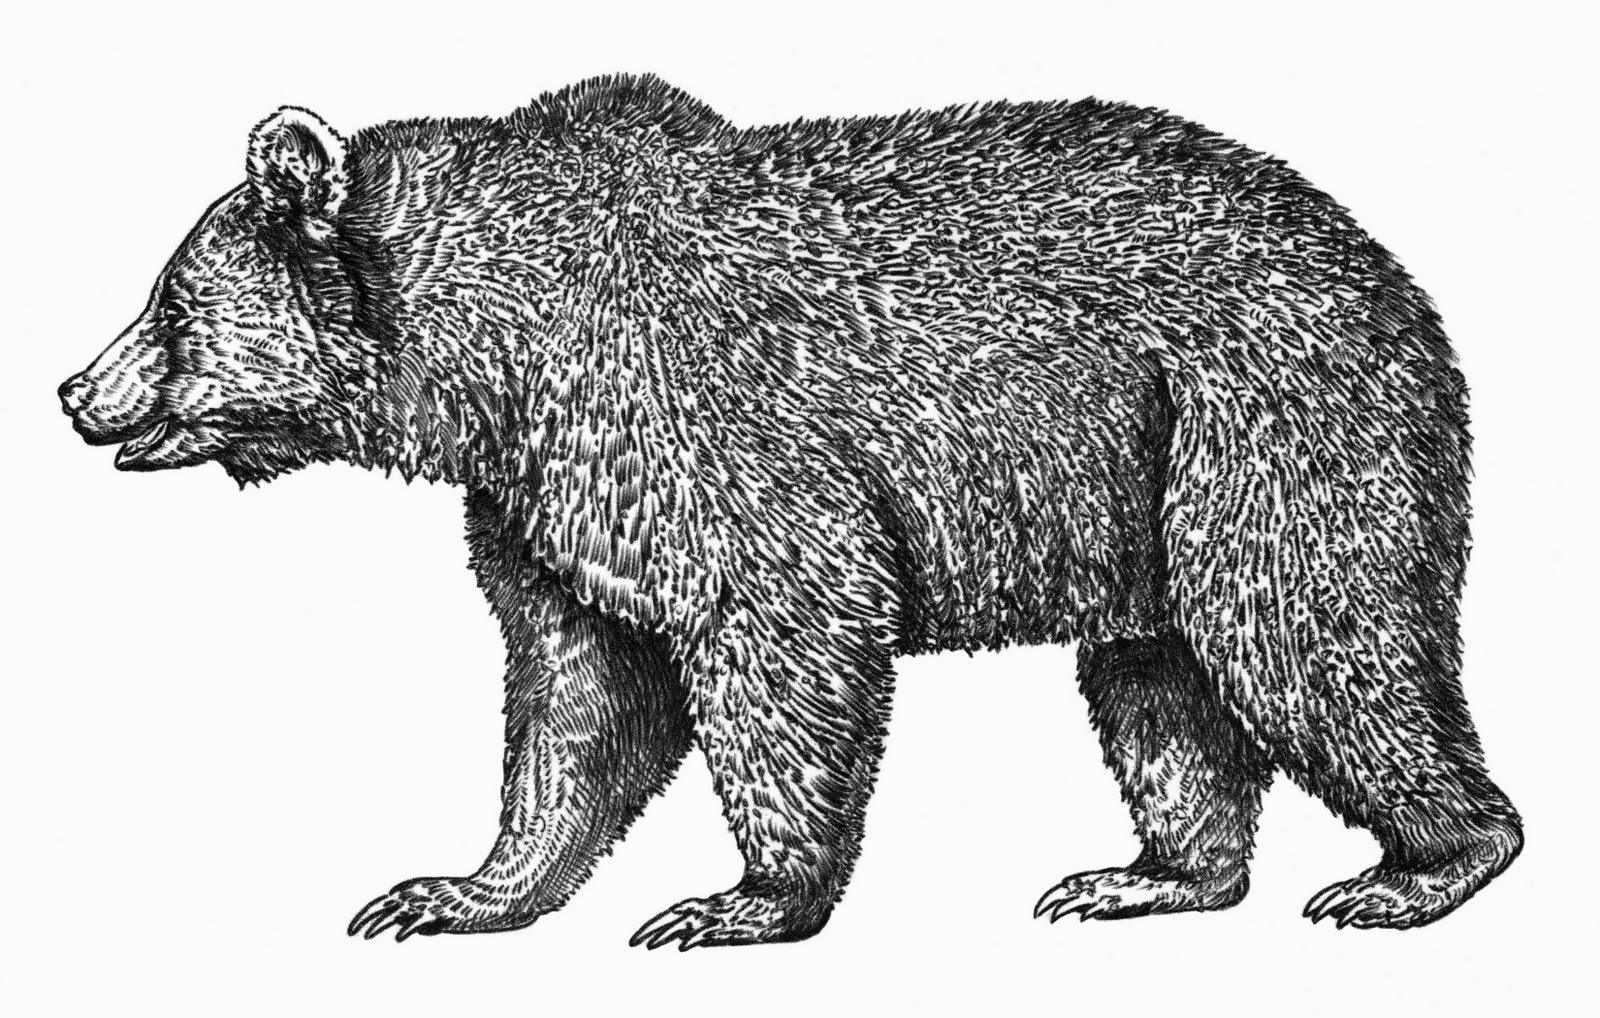 WRC Illustration & Design Blog: February 2011 Walking Bear Drawing